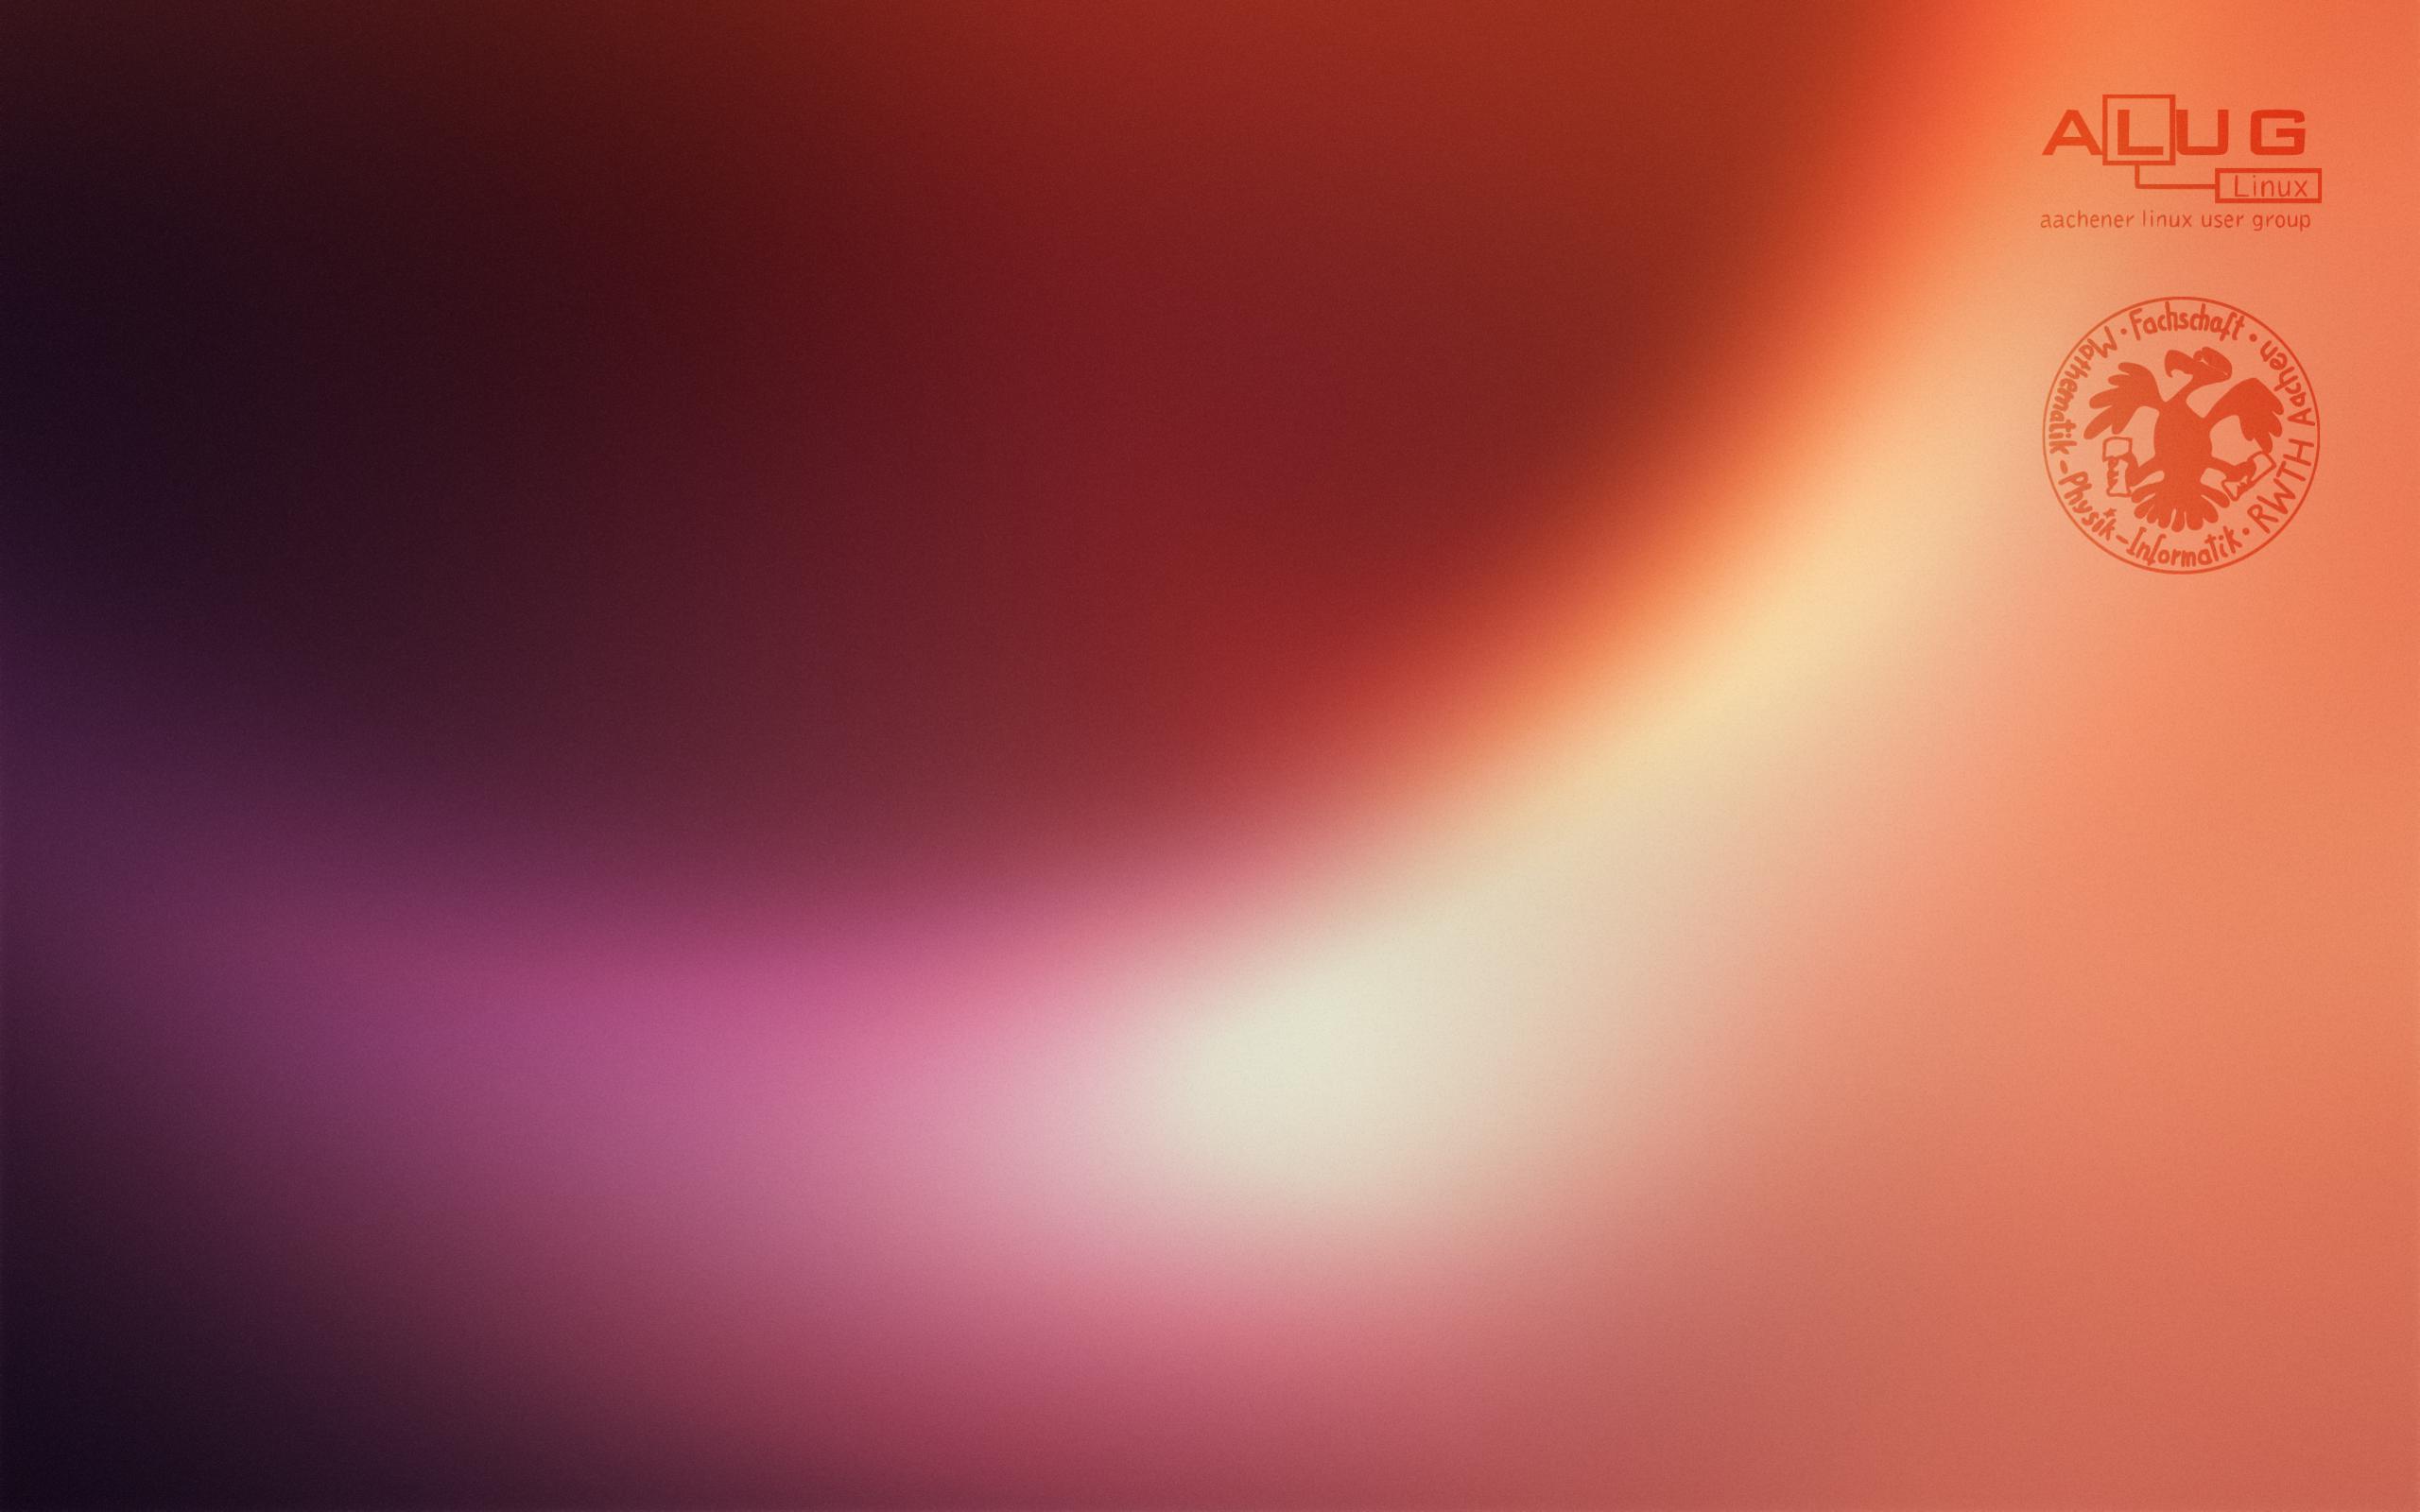 attic/ALUG+FSMPI-Background/background.png